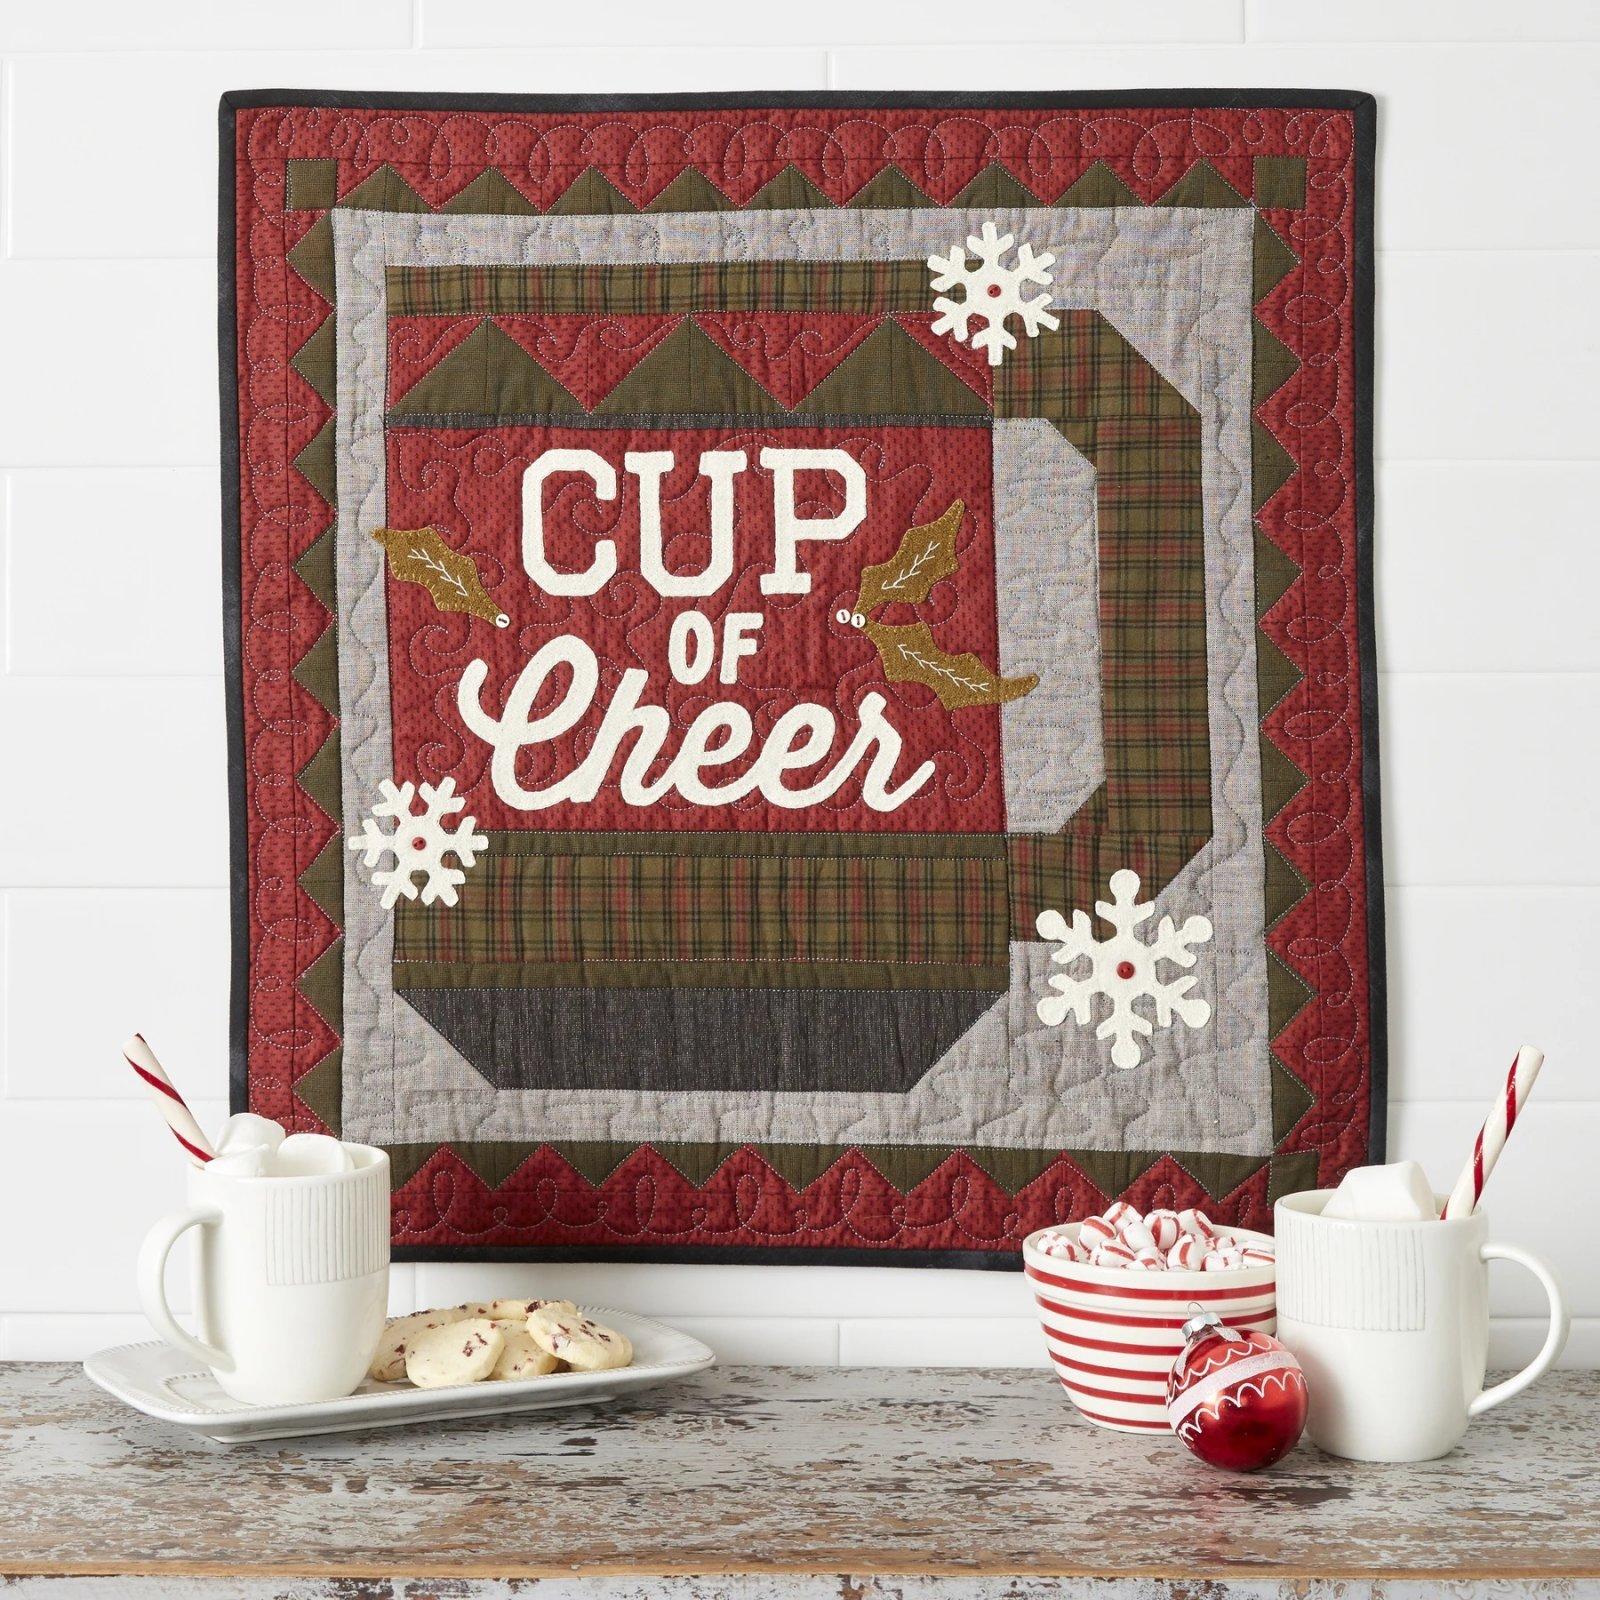 Buttermilk Basin Quilt Patterns - Cup of Cheer Quilt 22